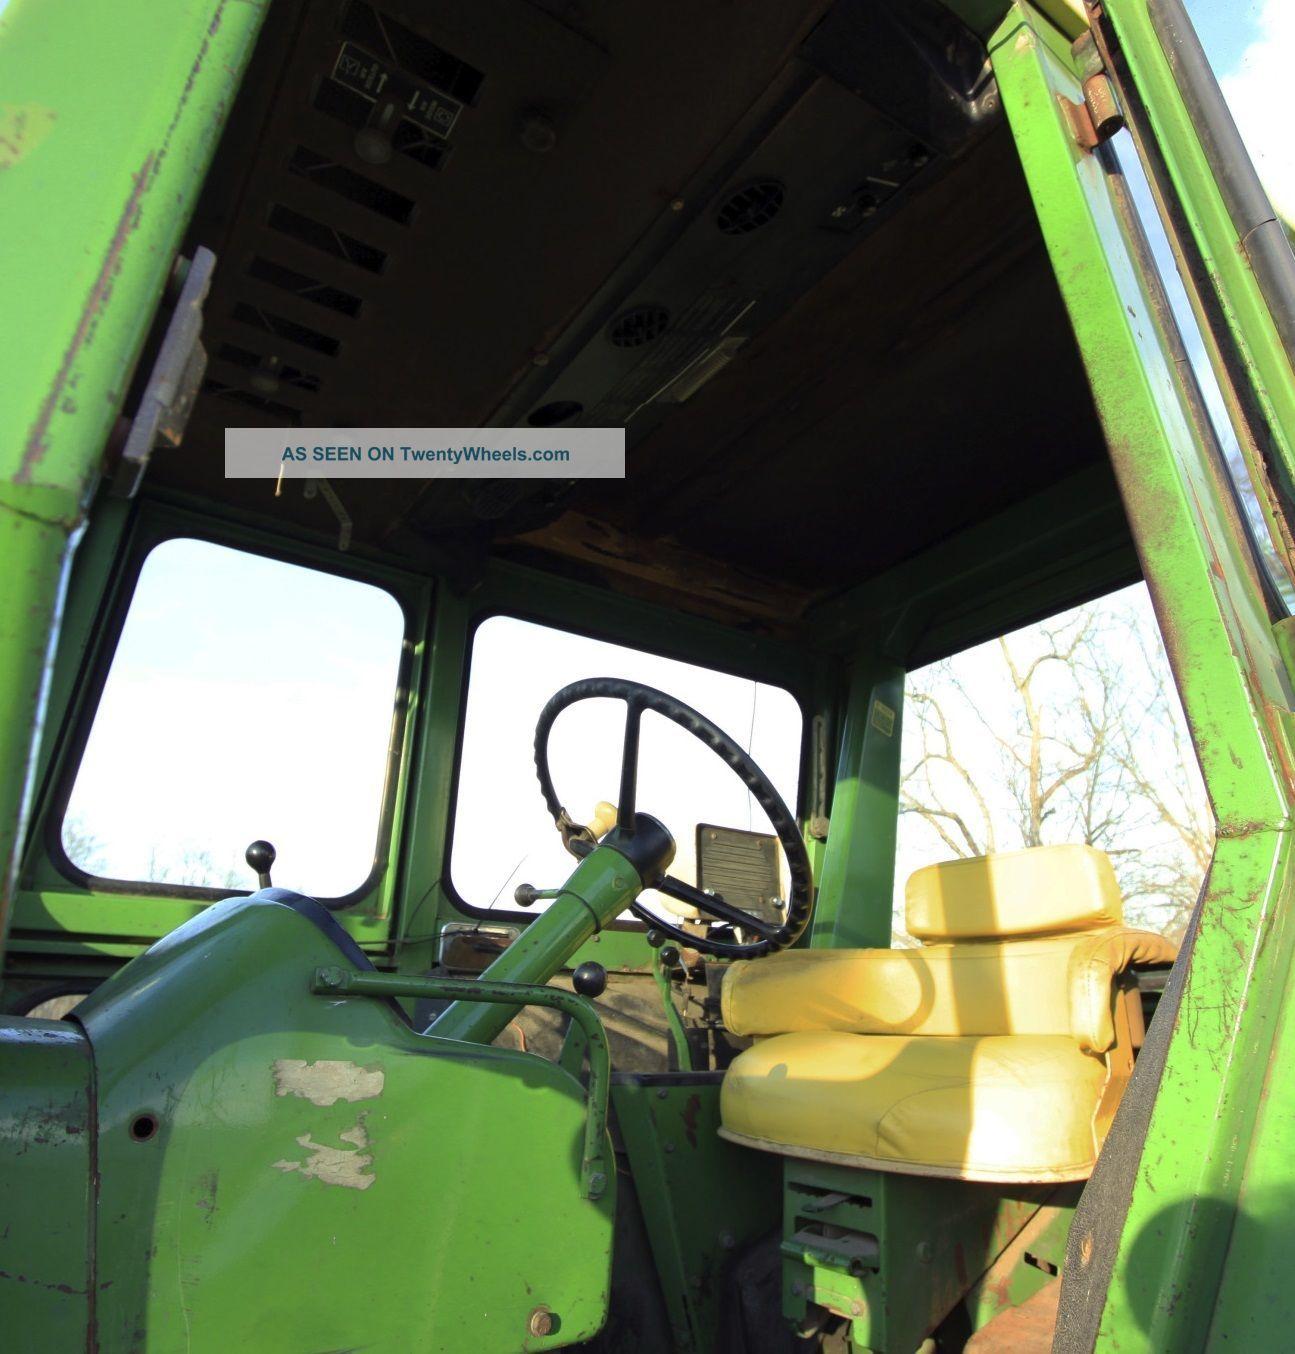 Desil John Deere 4320 Wiring Diagram Fuse Box 4020 Diesel Tractor Specs Images Of Home Design On 1967